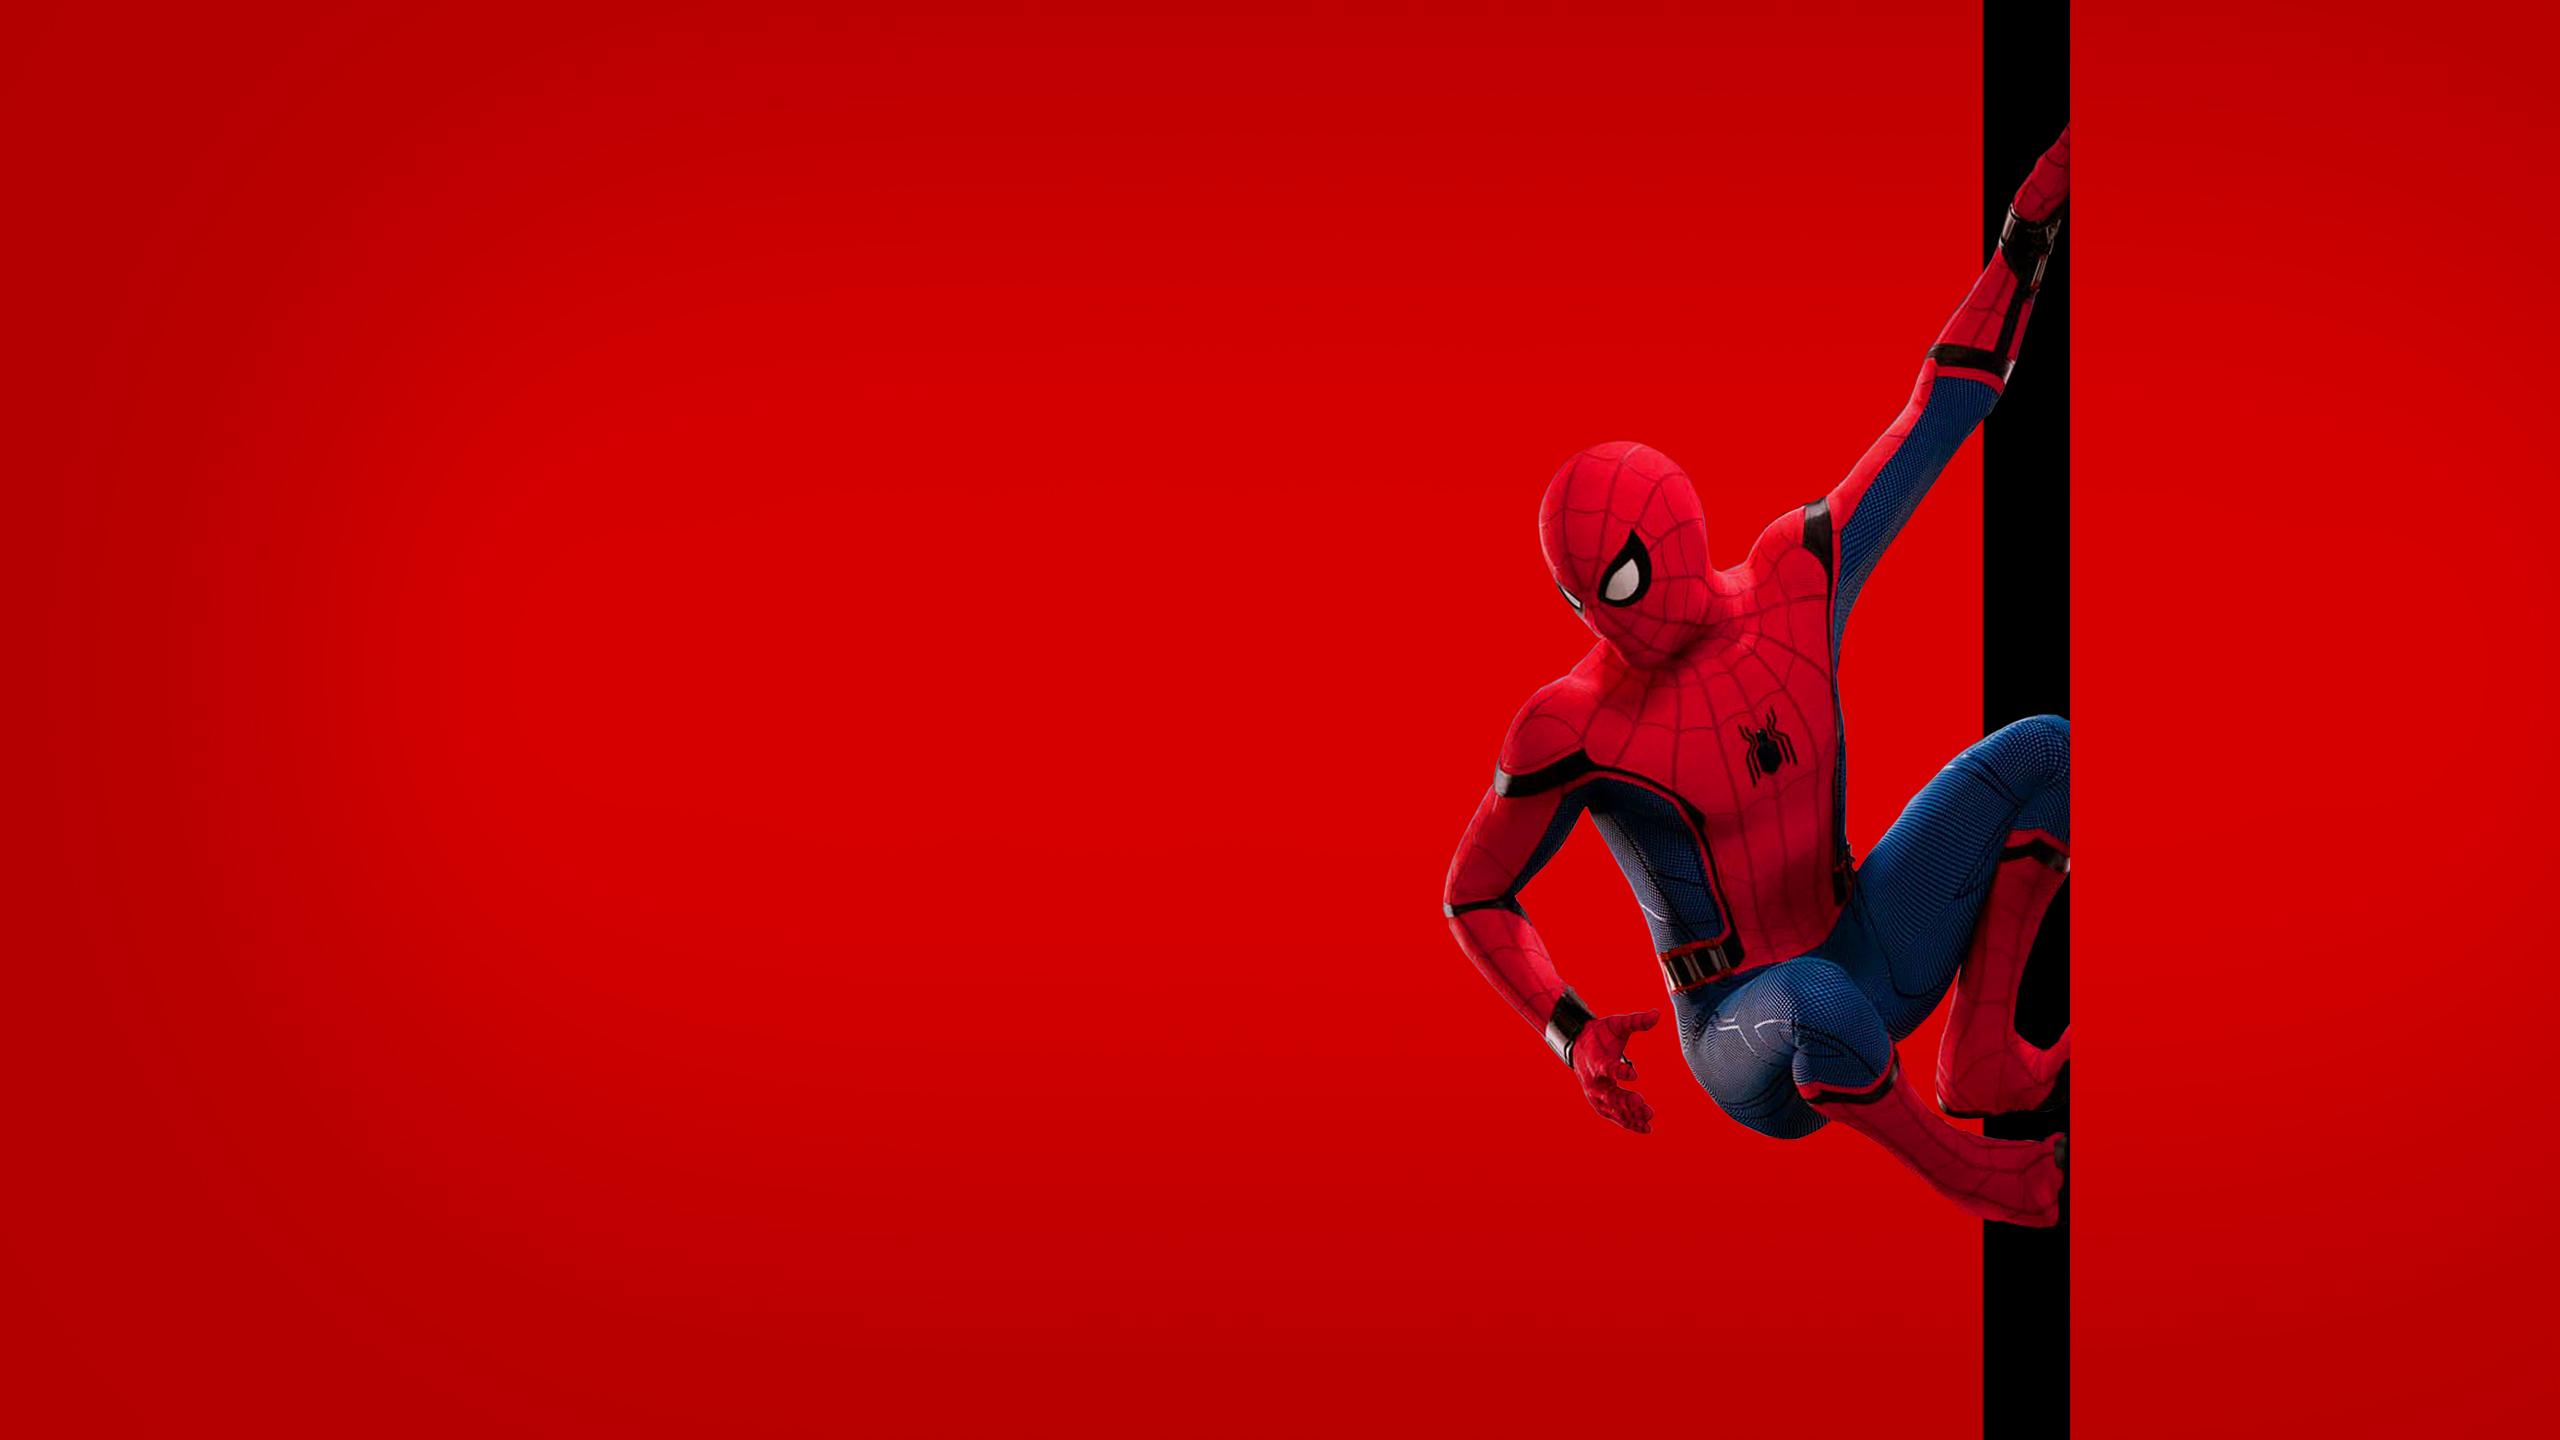 Spider Man Homecoming Wallpaper 15   2560 X 1440 stmednet 2560x1440